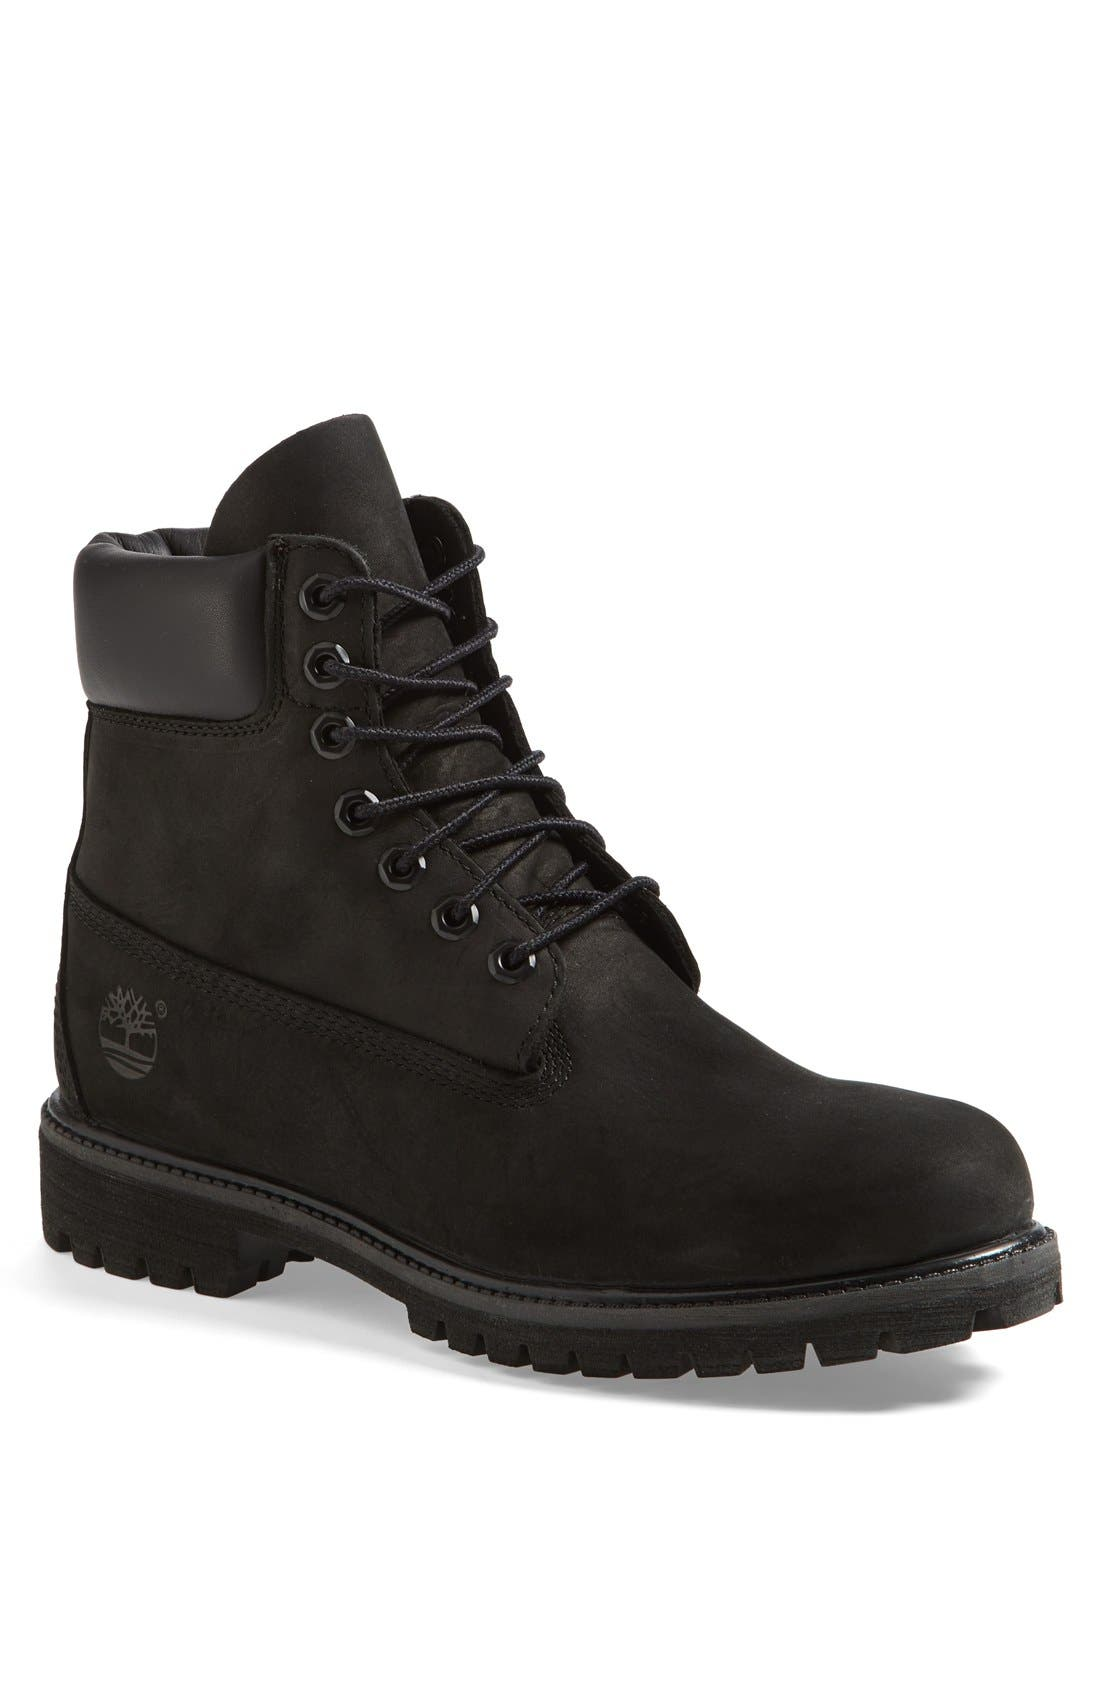 TIMBERLAND, Six Inch Classic Waterproof Boots - Premium Waterproof Boot, Main thumbnail 1, color, BLACK